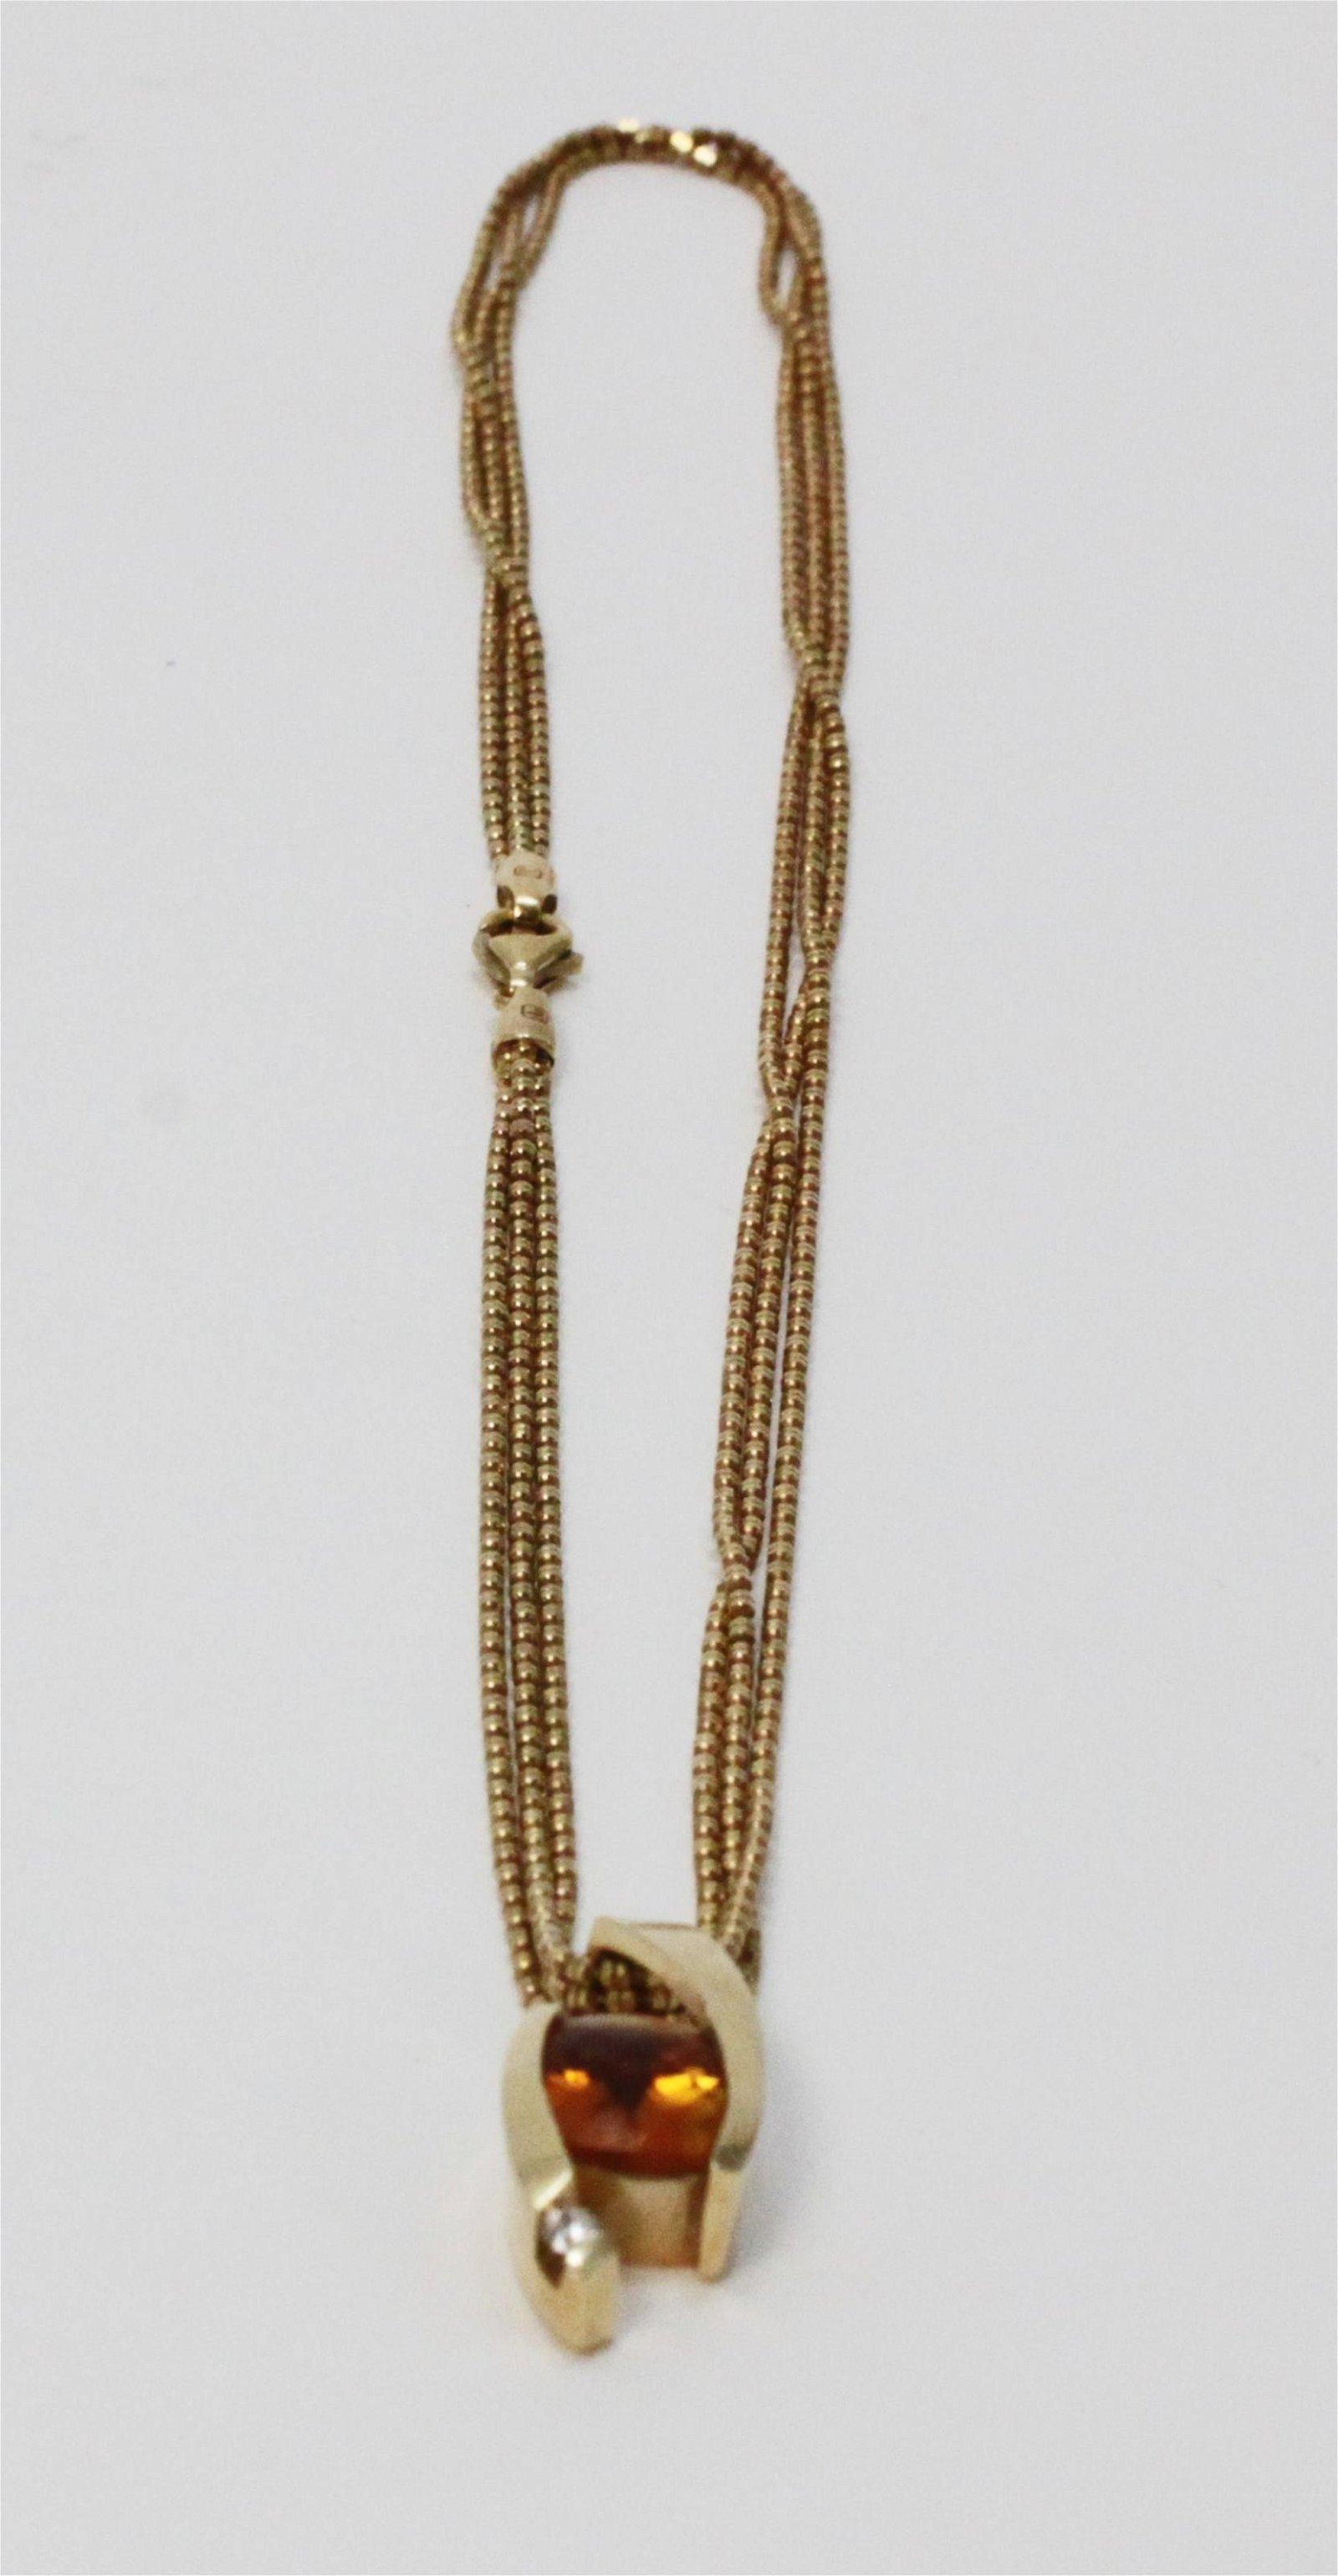 Cushion Cut Orange Sapphire & 14k Gold Pendant